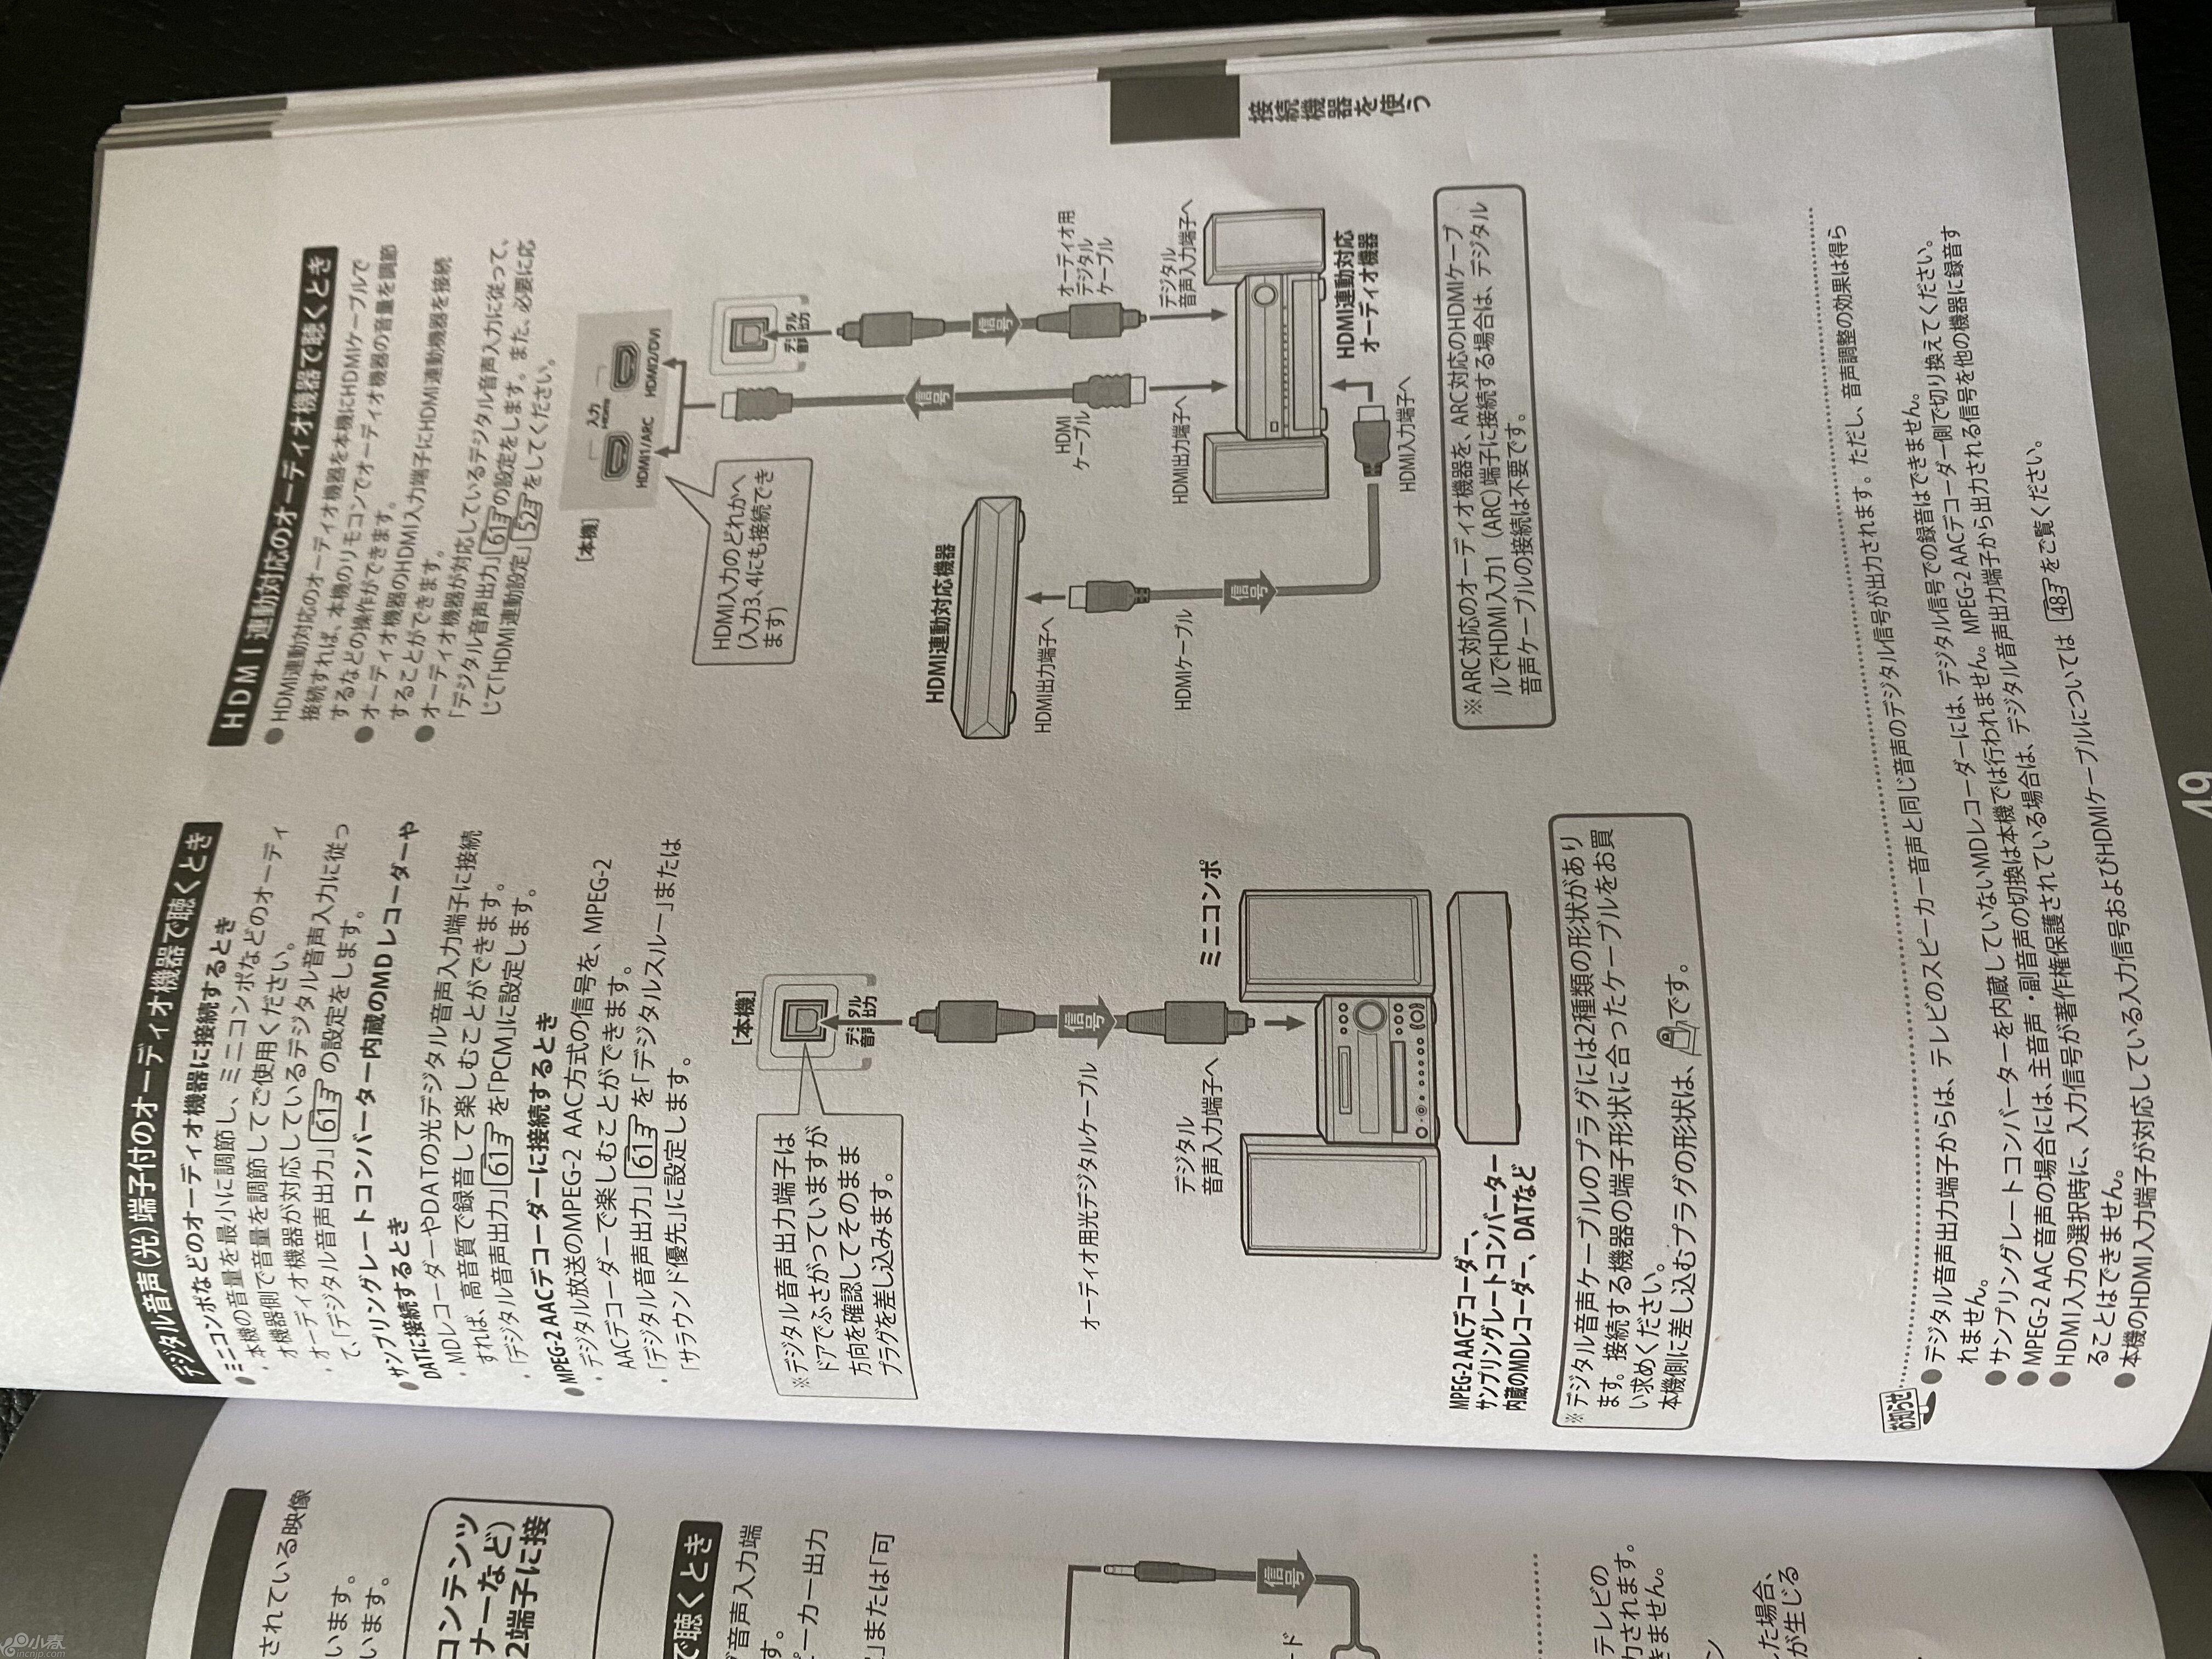 5D835A81-6B0A-43B8-963A-802F0AD07ACE.jpeg